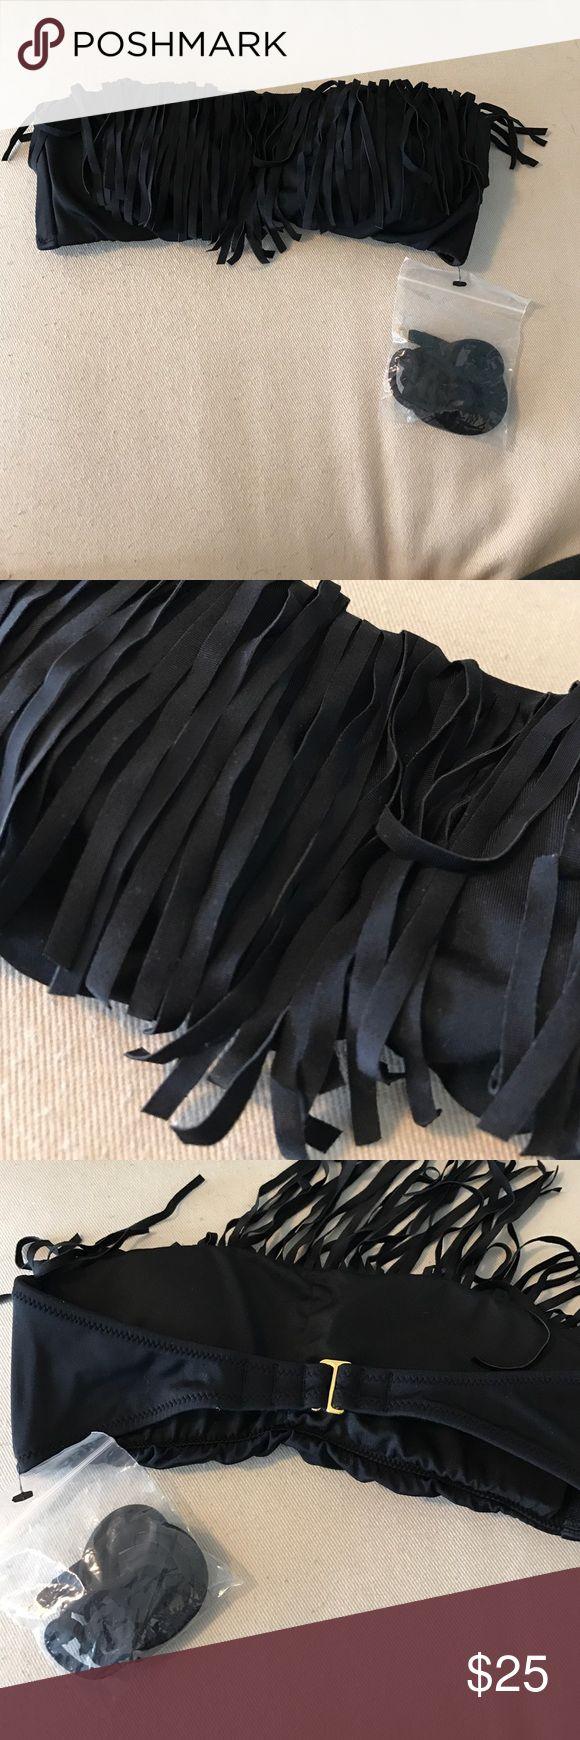 VS Swim Top XS Fringe Victoria's Secret Swim Top with straps still attached! Never worn! They don't make their Swim line anymore! Check out my bundle deals! Victoria's Secret Swim Bikinis